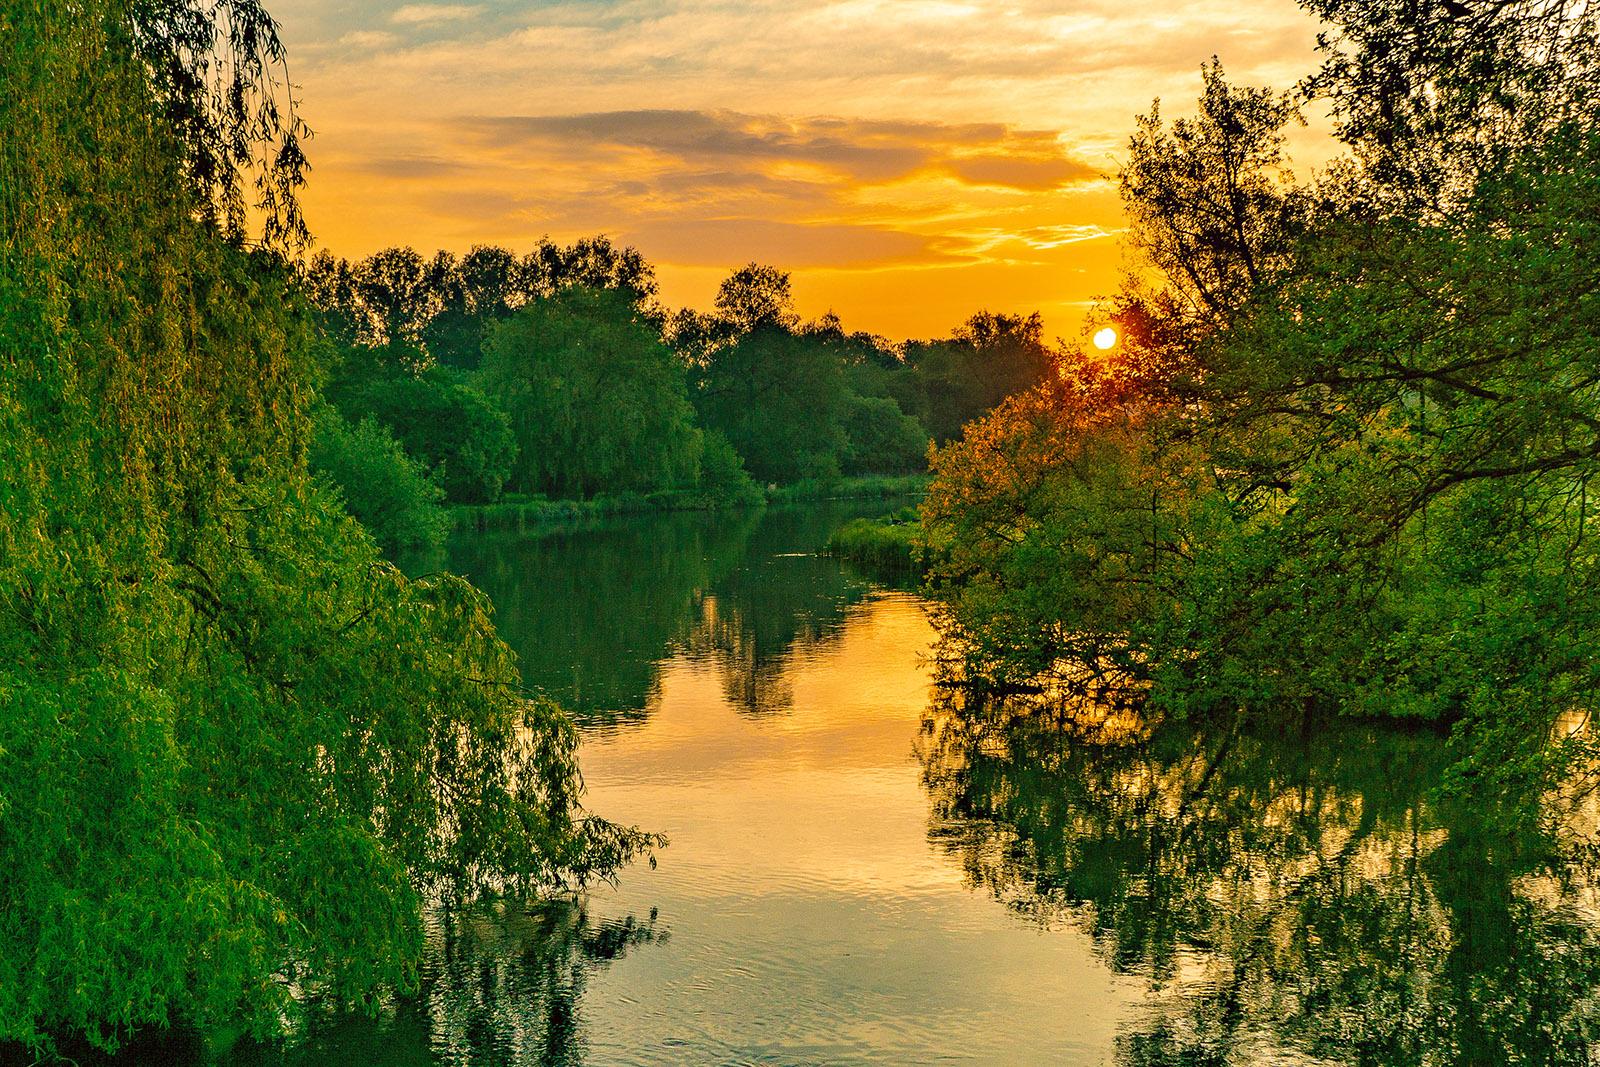 'Woodford Sunrise' by Terry Waldren